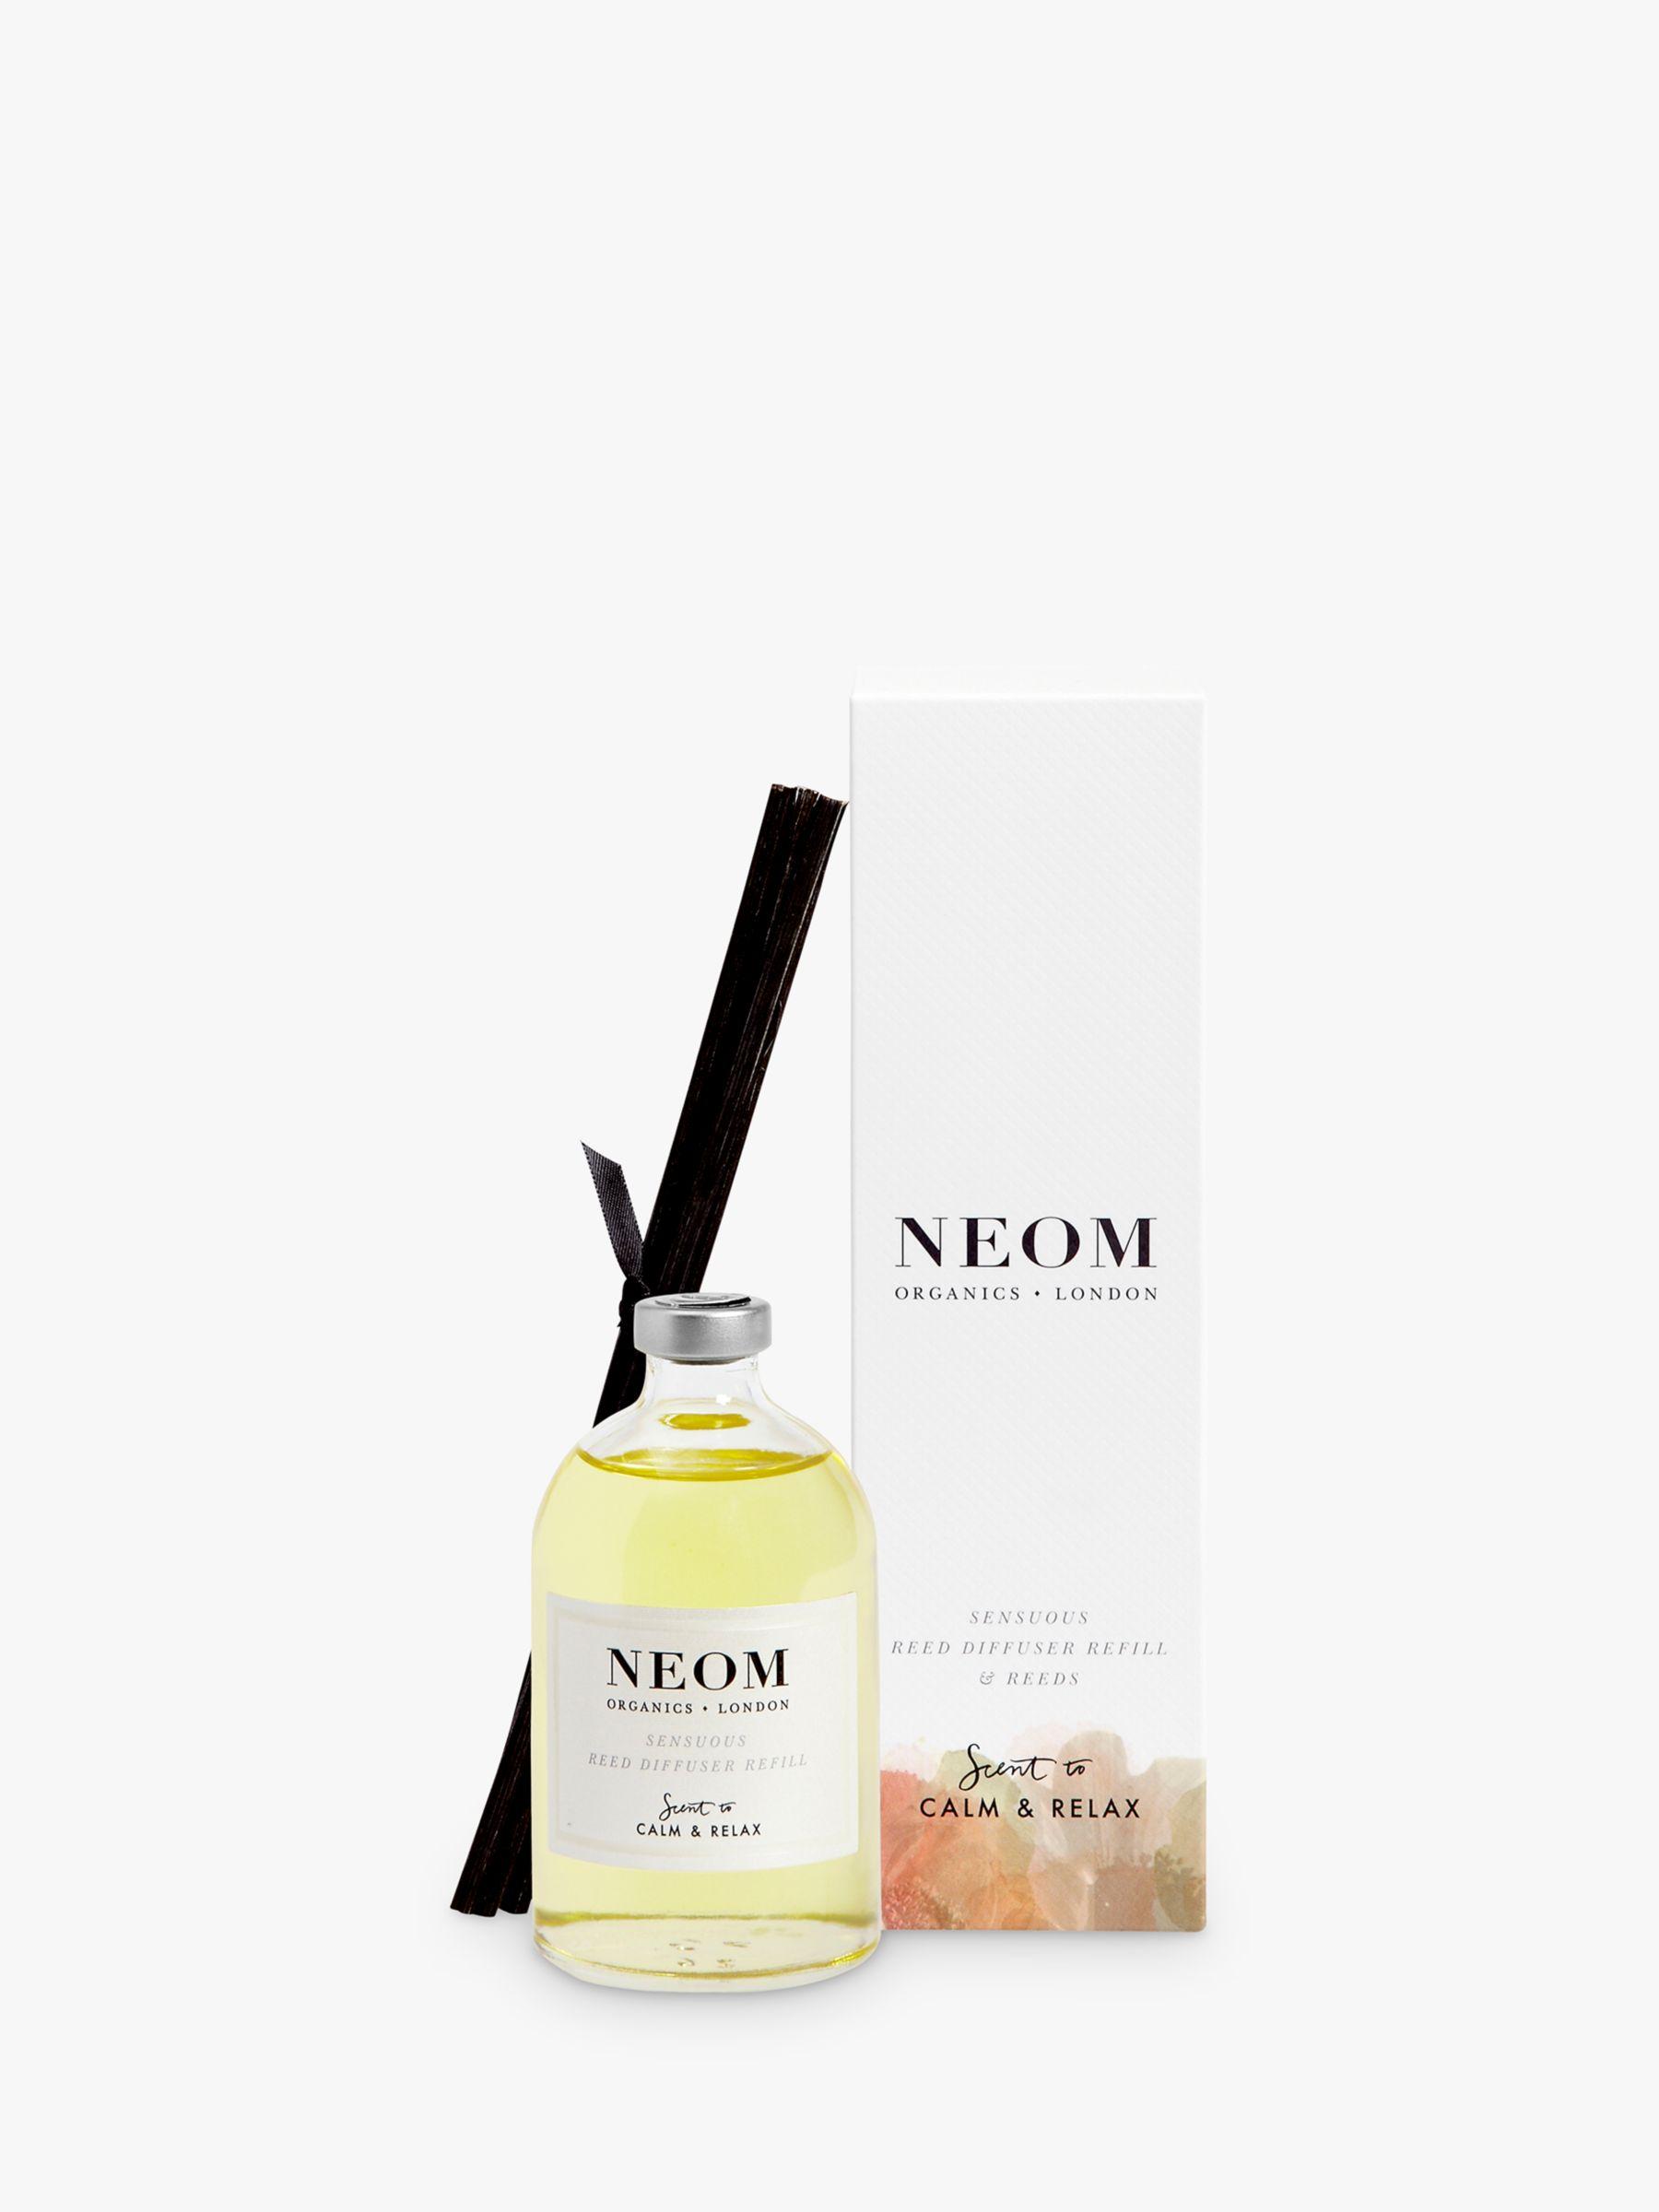 Neom Neom Sensuous Diffuser Refill, 100ml